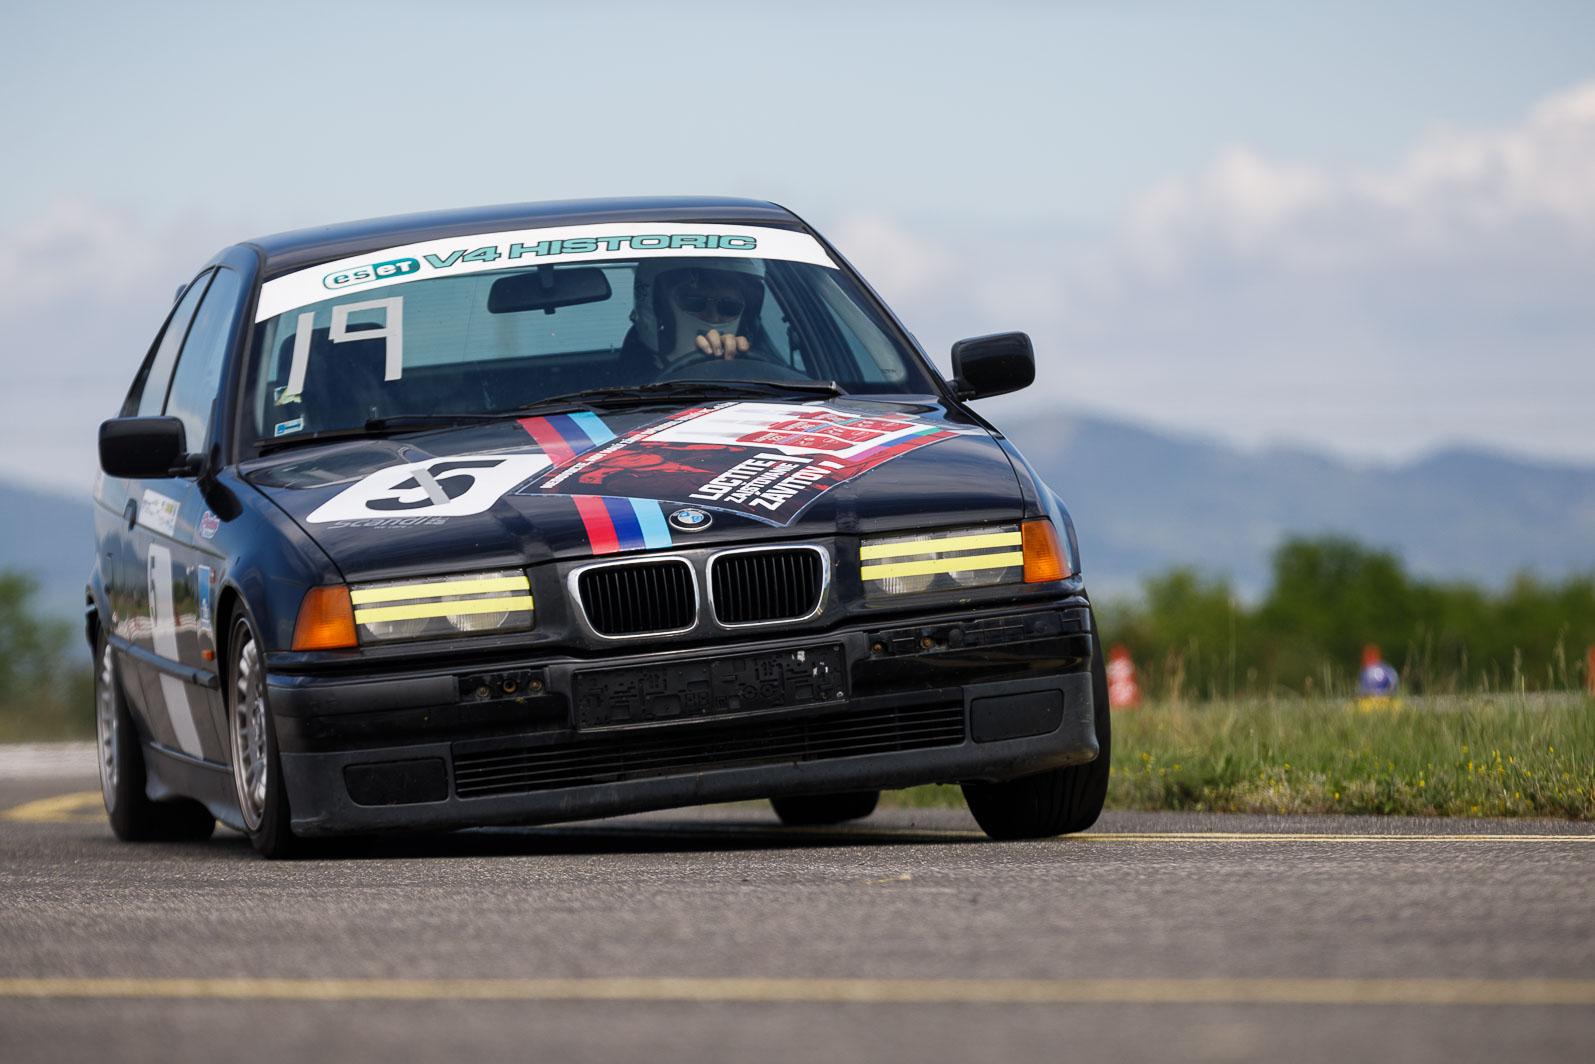 Sezóna pretekárskych veteránov začala NDF4CXlmMB piestany-5727